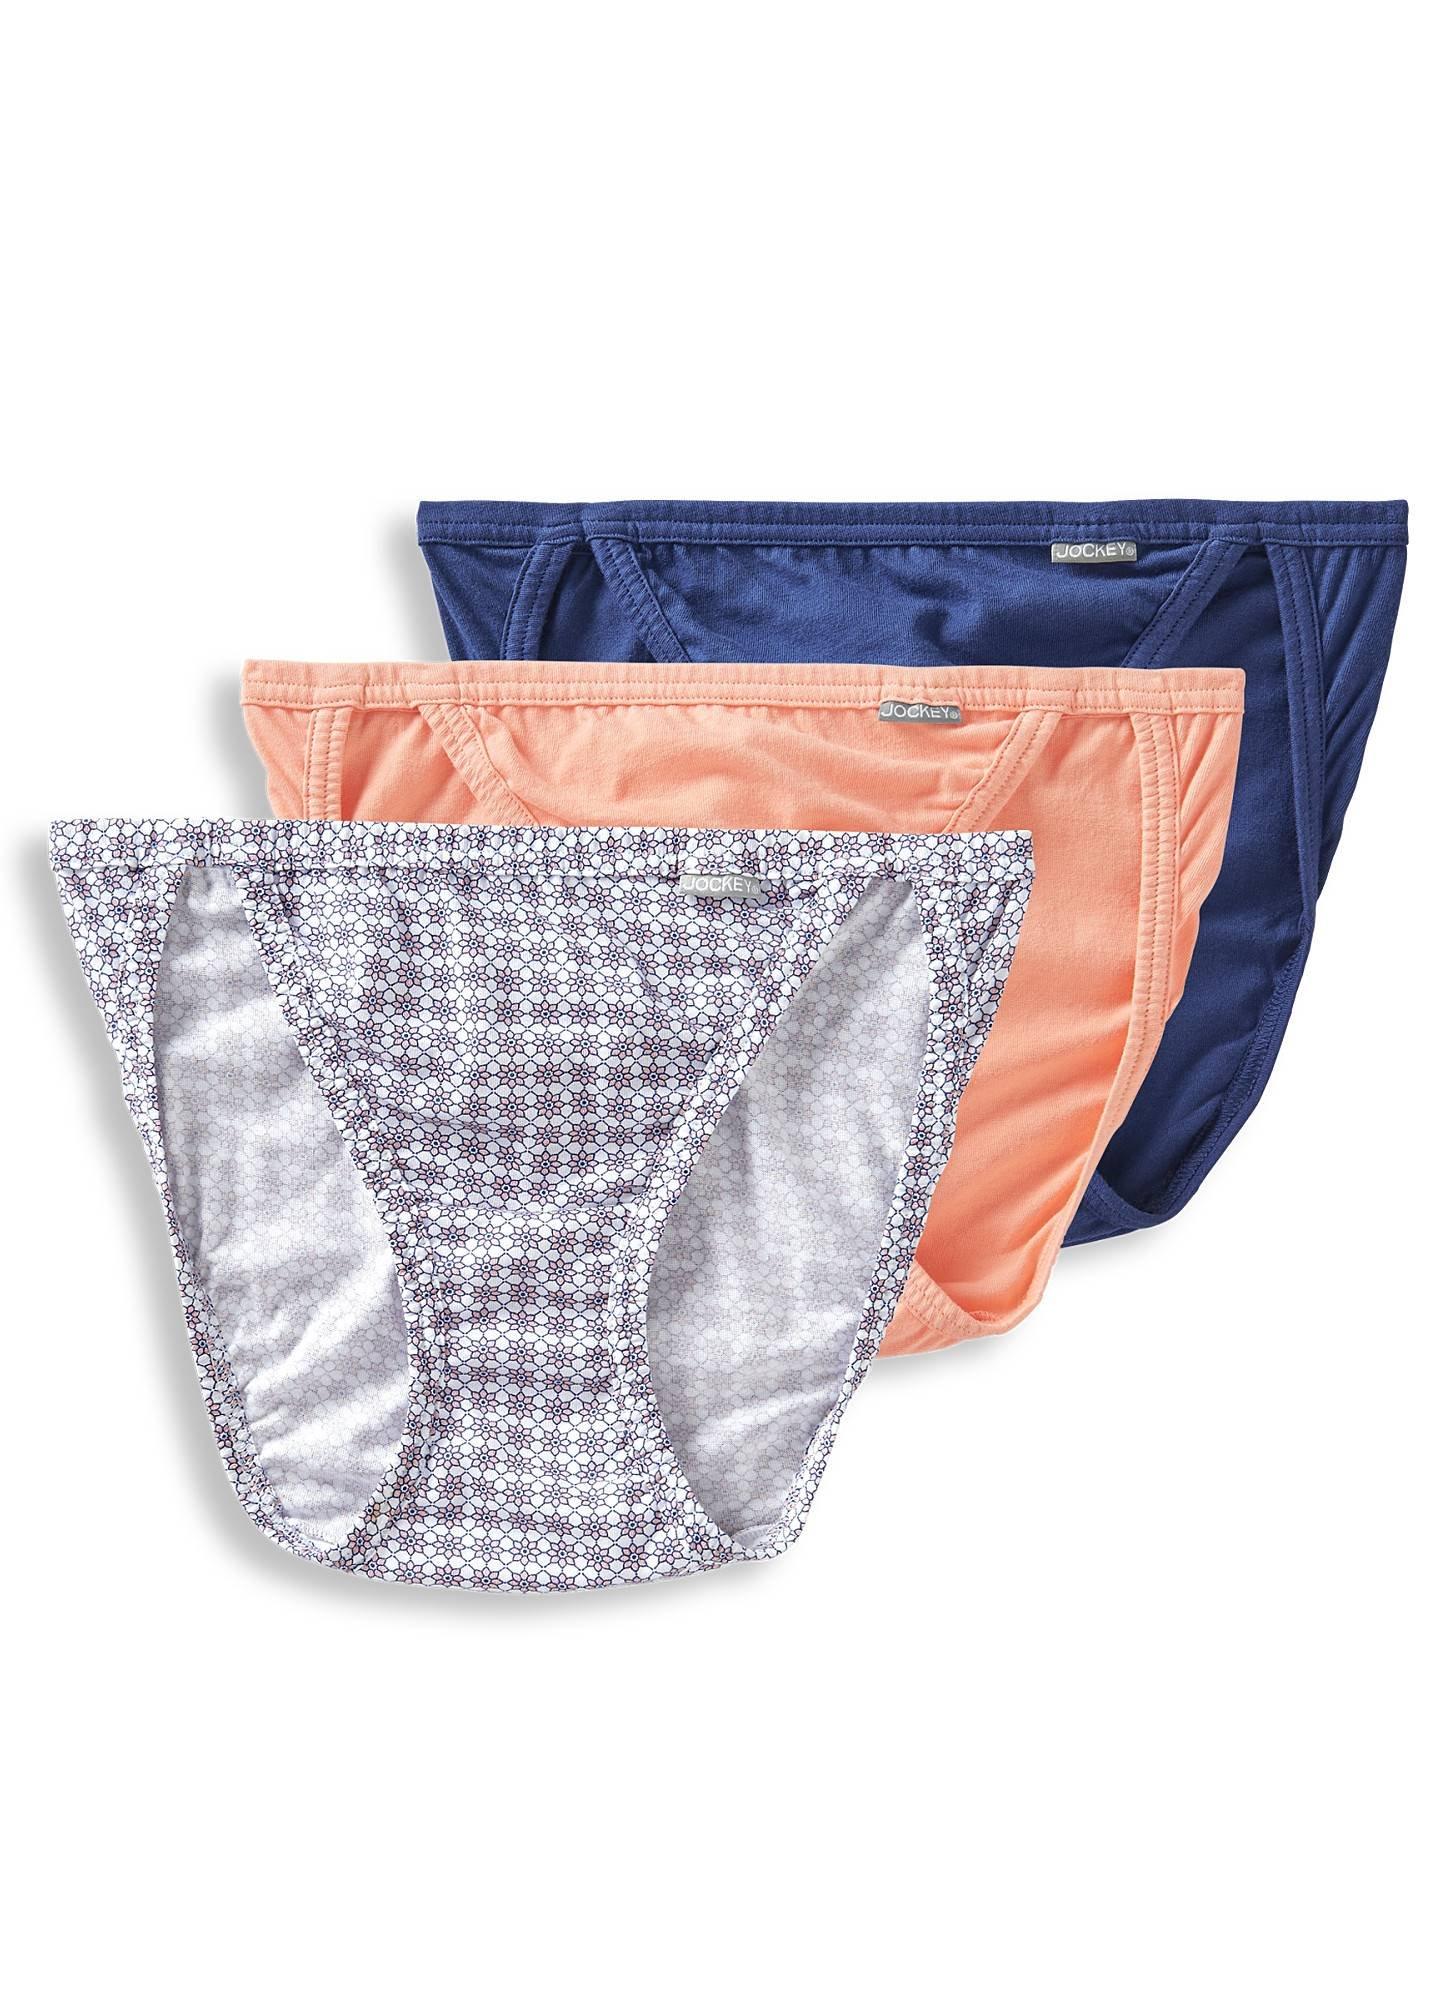 b786748c179d Jockey String Bikini Underwear